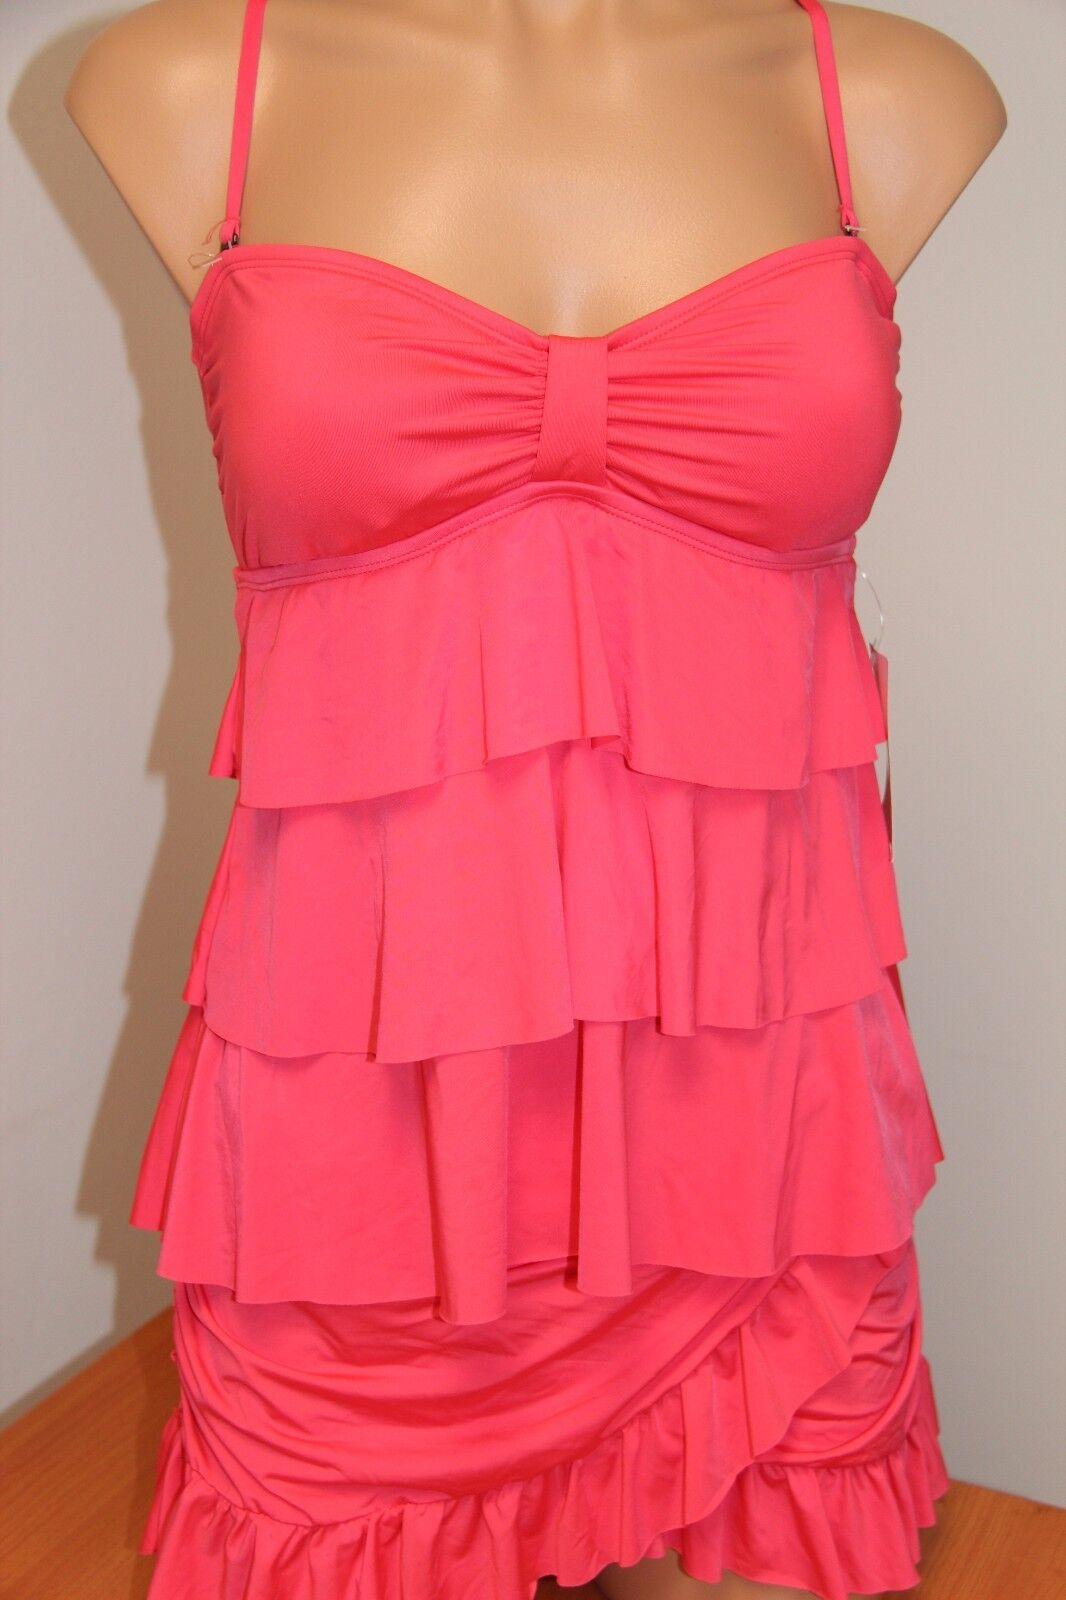 NWT Kenneth Cole Reaction Swimsuit Tankini 2pc Set Sz M Skirt Ruffle BCR Strap